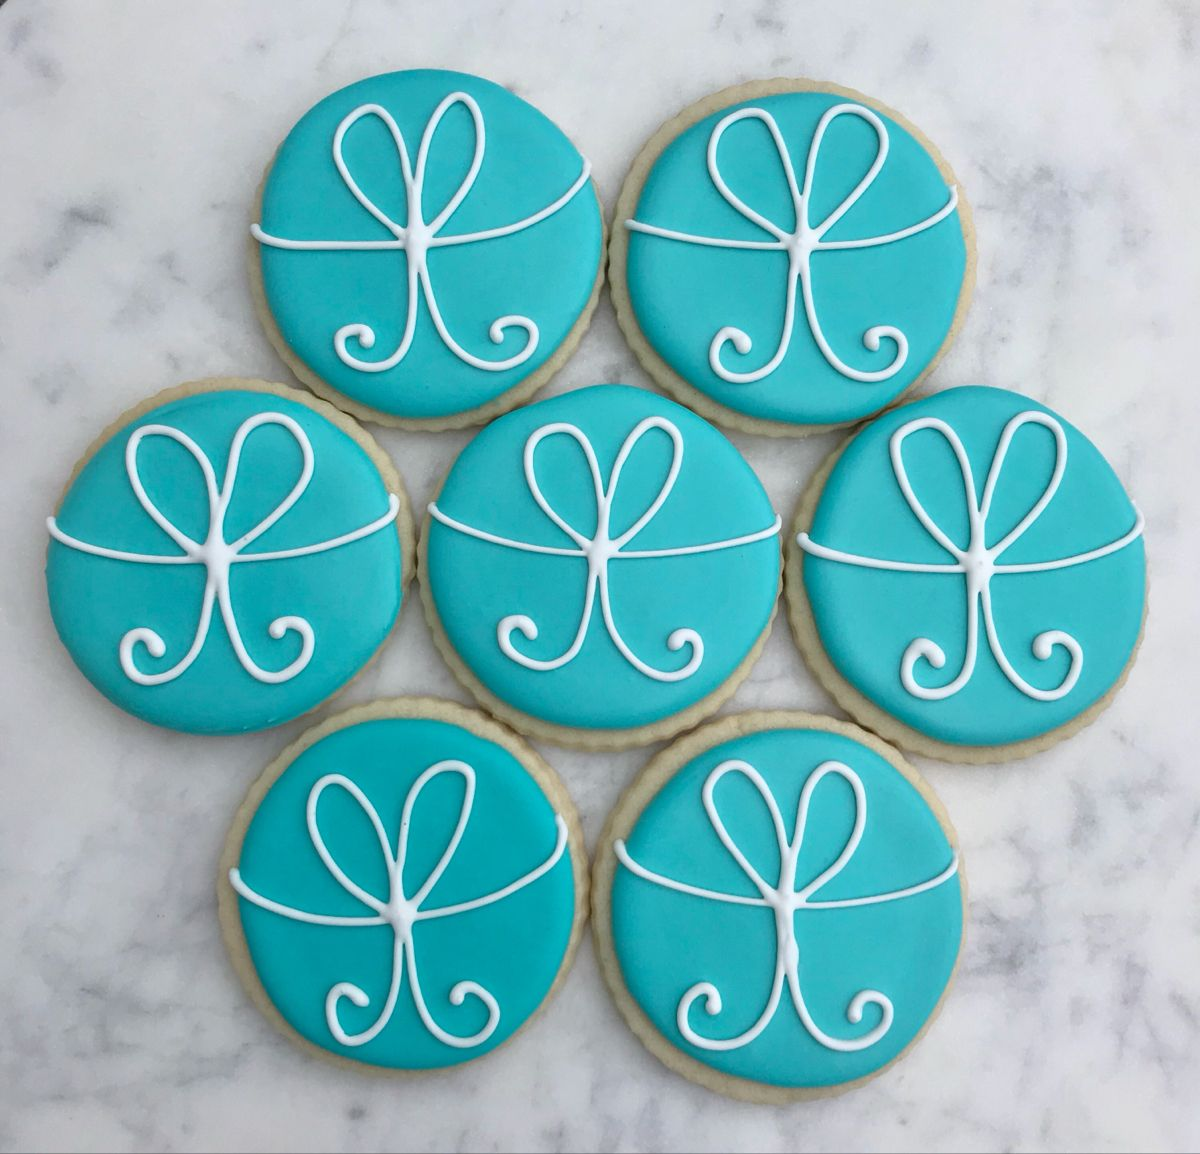 #decoratedsugarcookies #decoratedcookies #sugarcookies #tiffanyandco #tiffanyblue